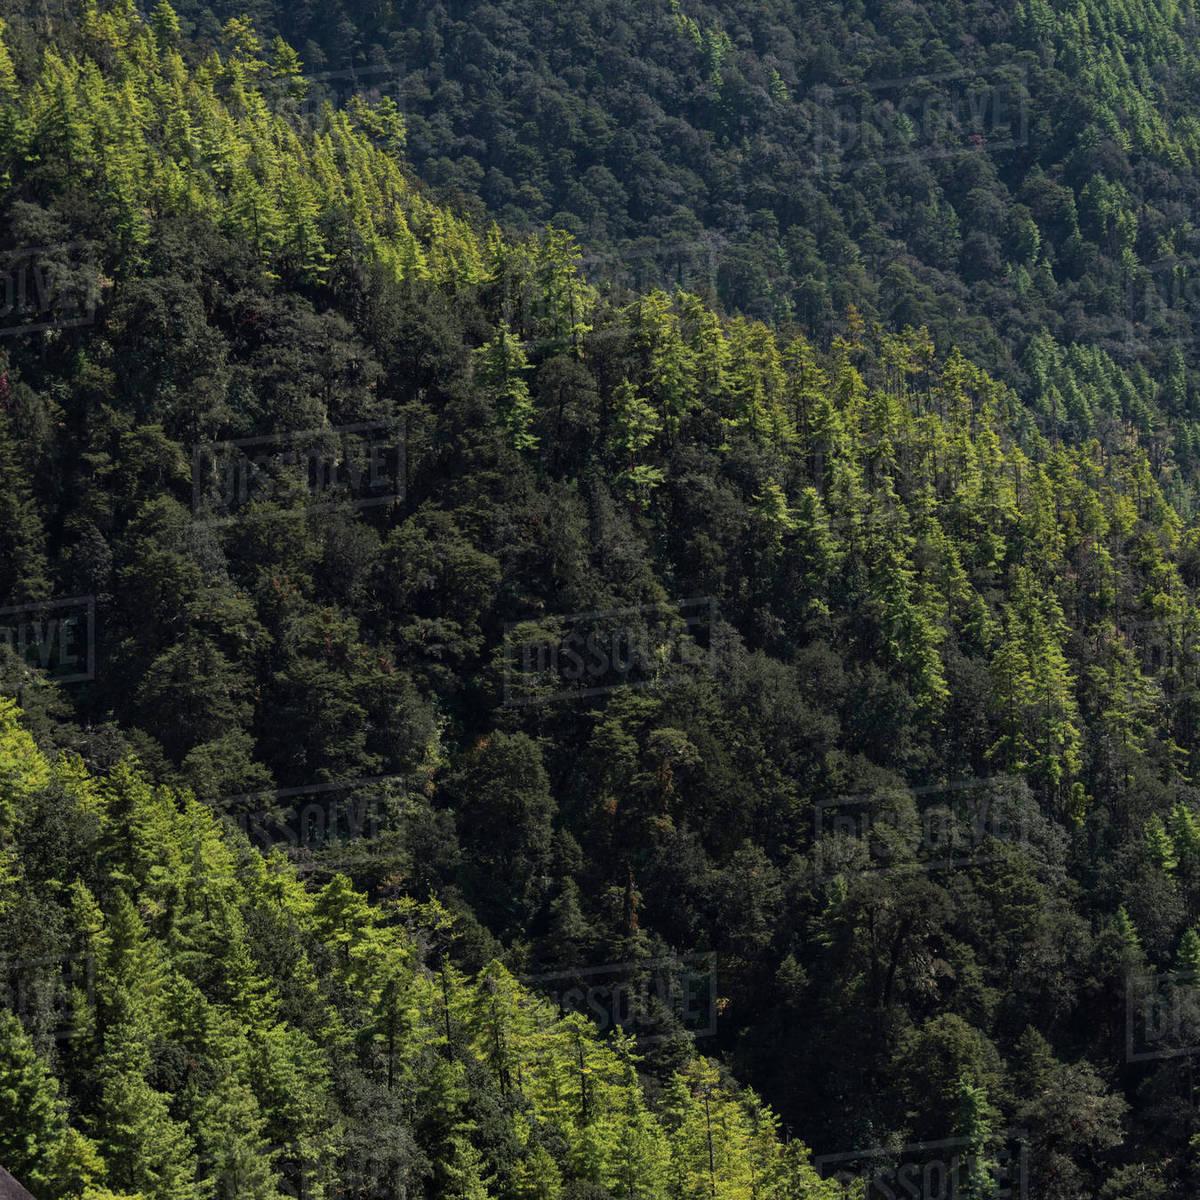 Original art watercolor painting, measuring: Dense Forest On A Mountainside Taktsang Trail Paro Bhutan Stock Photo Dissolve